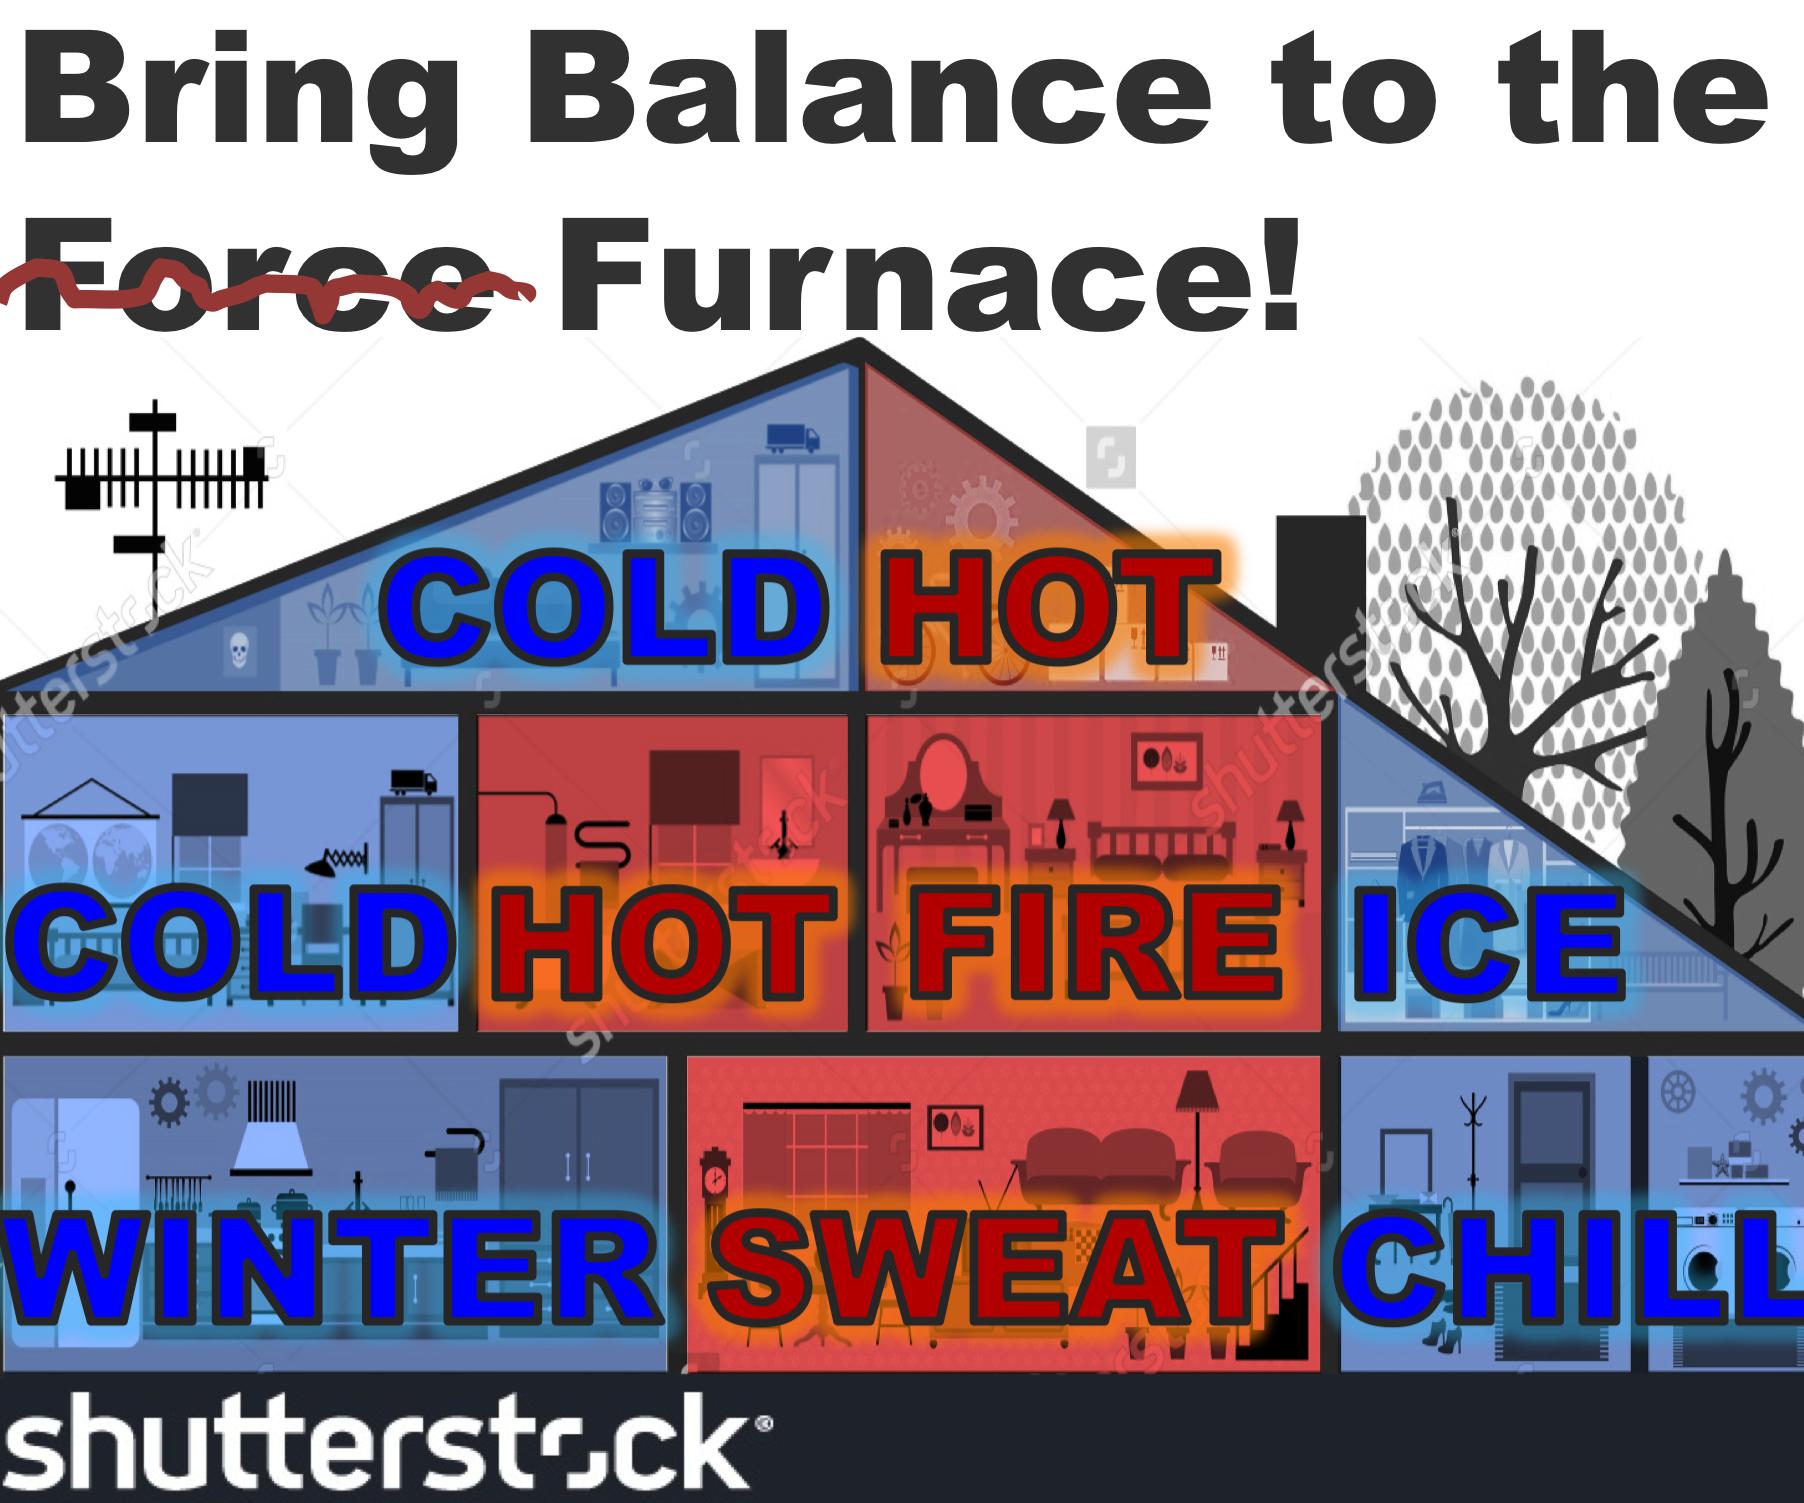 Balance to the Furnace